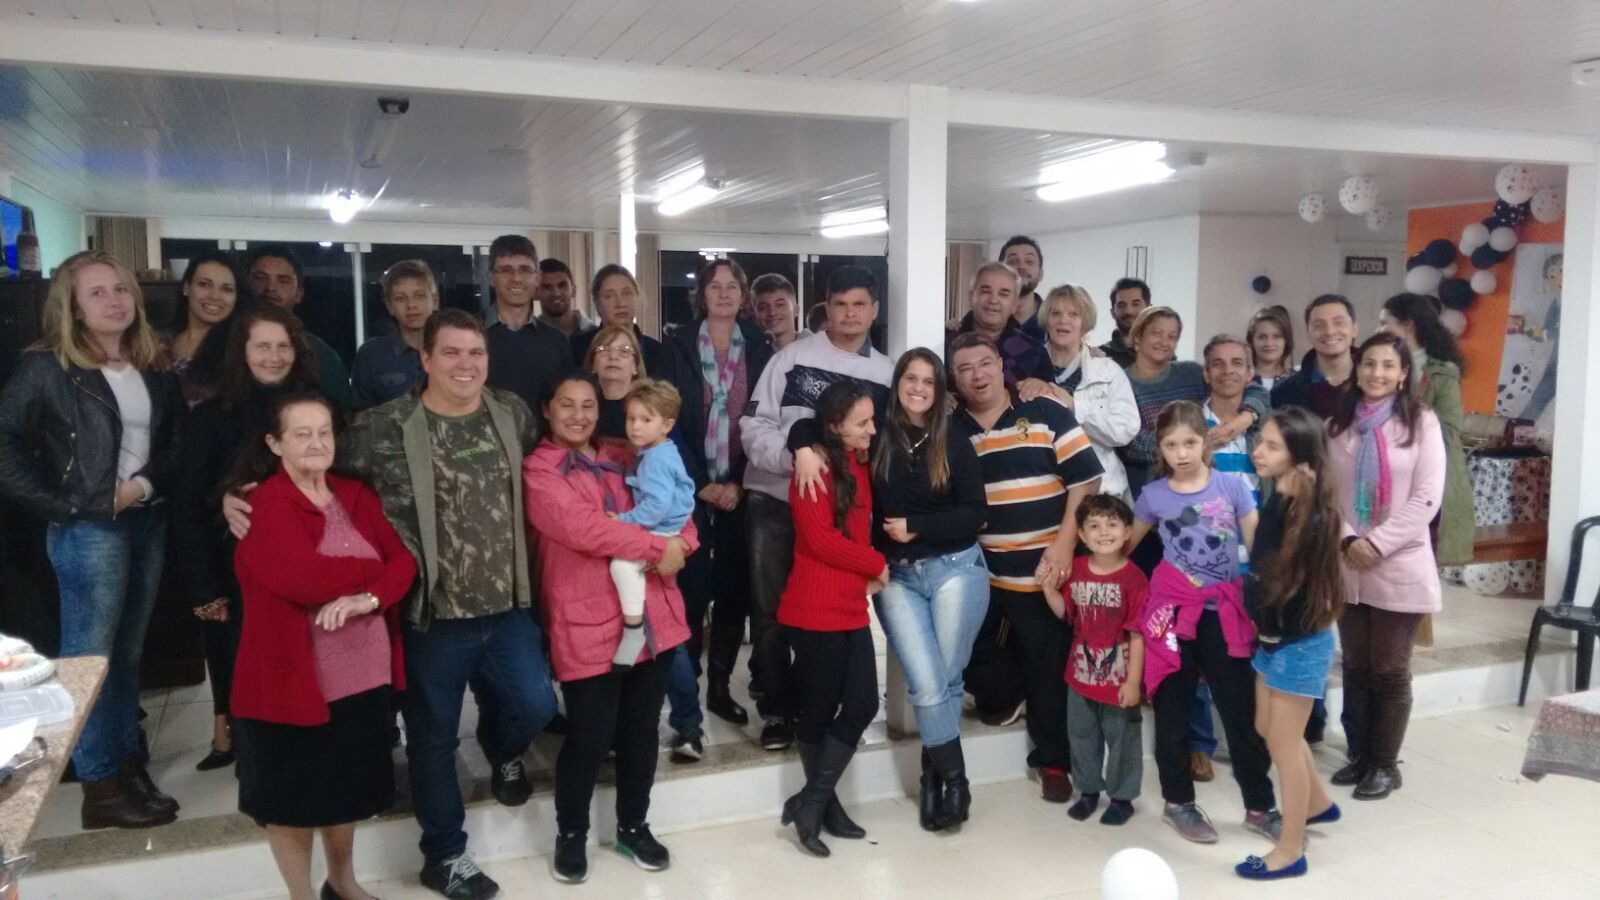 Linda festa da Igreja em Curitiba